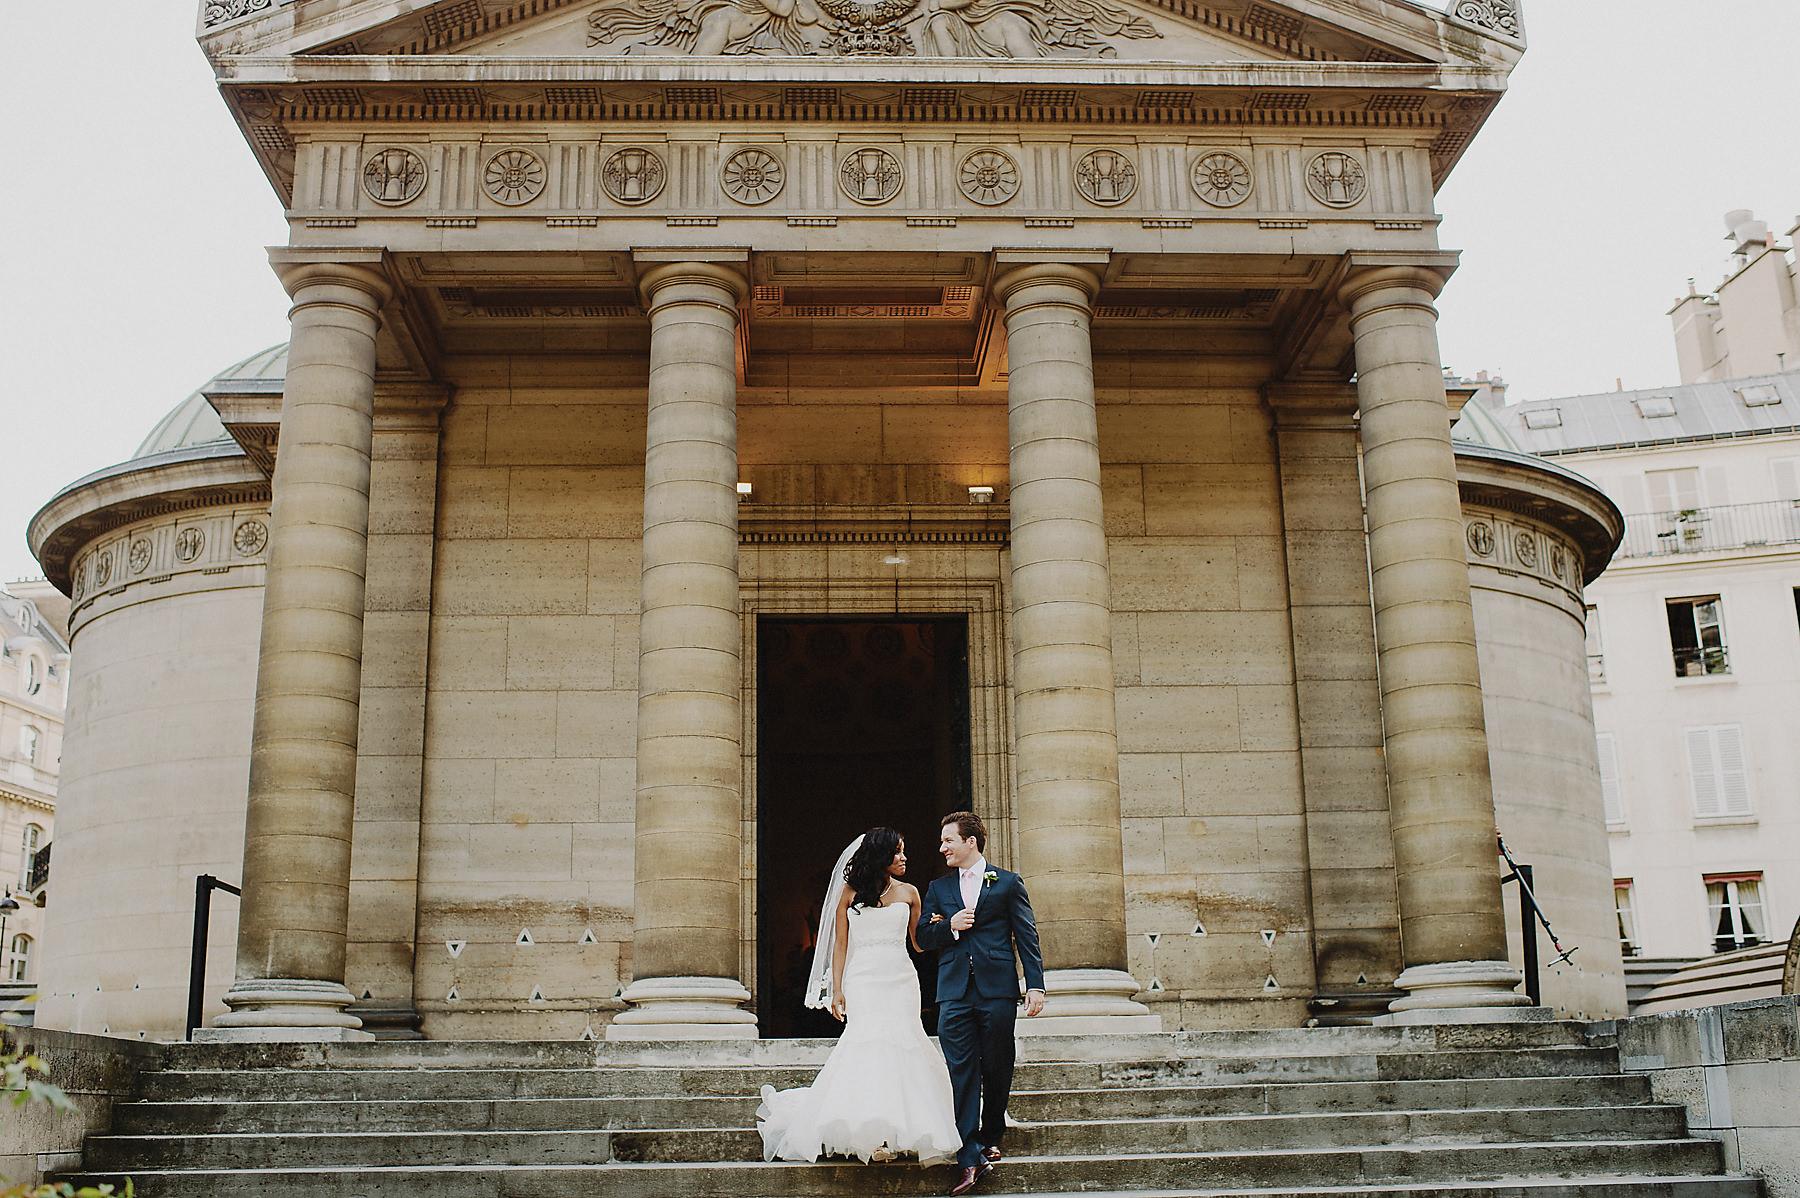 Arc de triumph wedding photographer